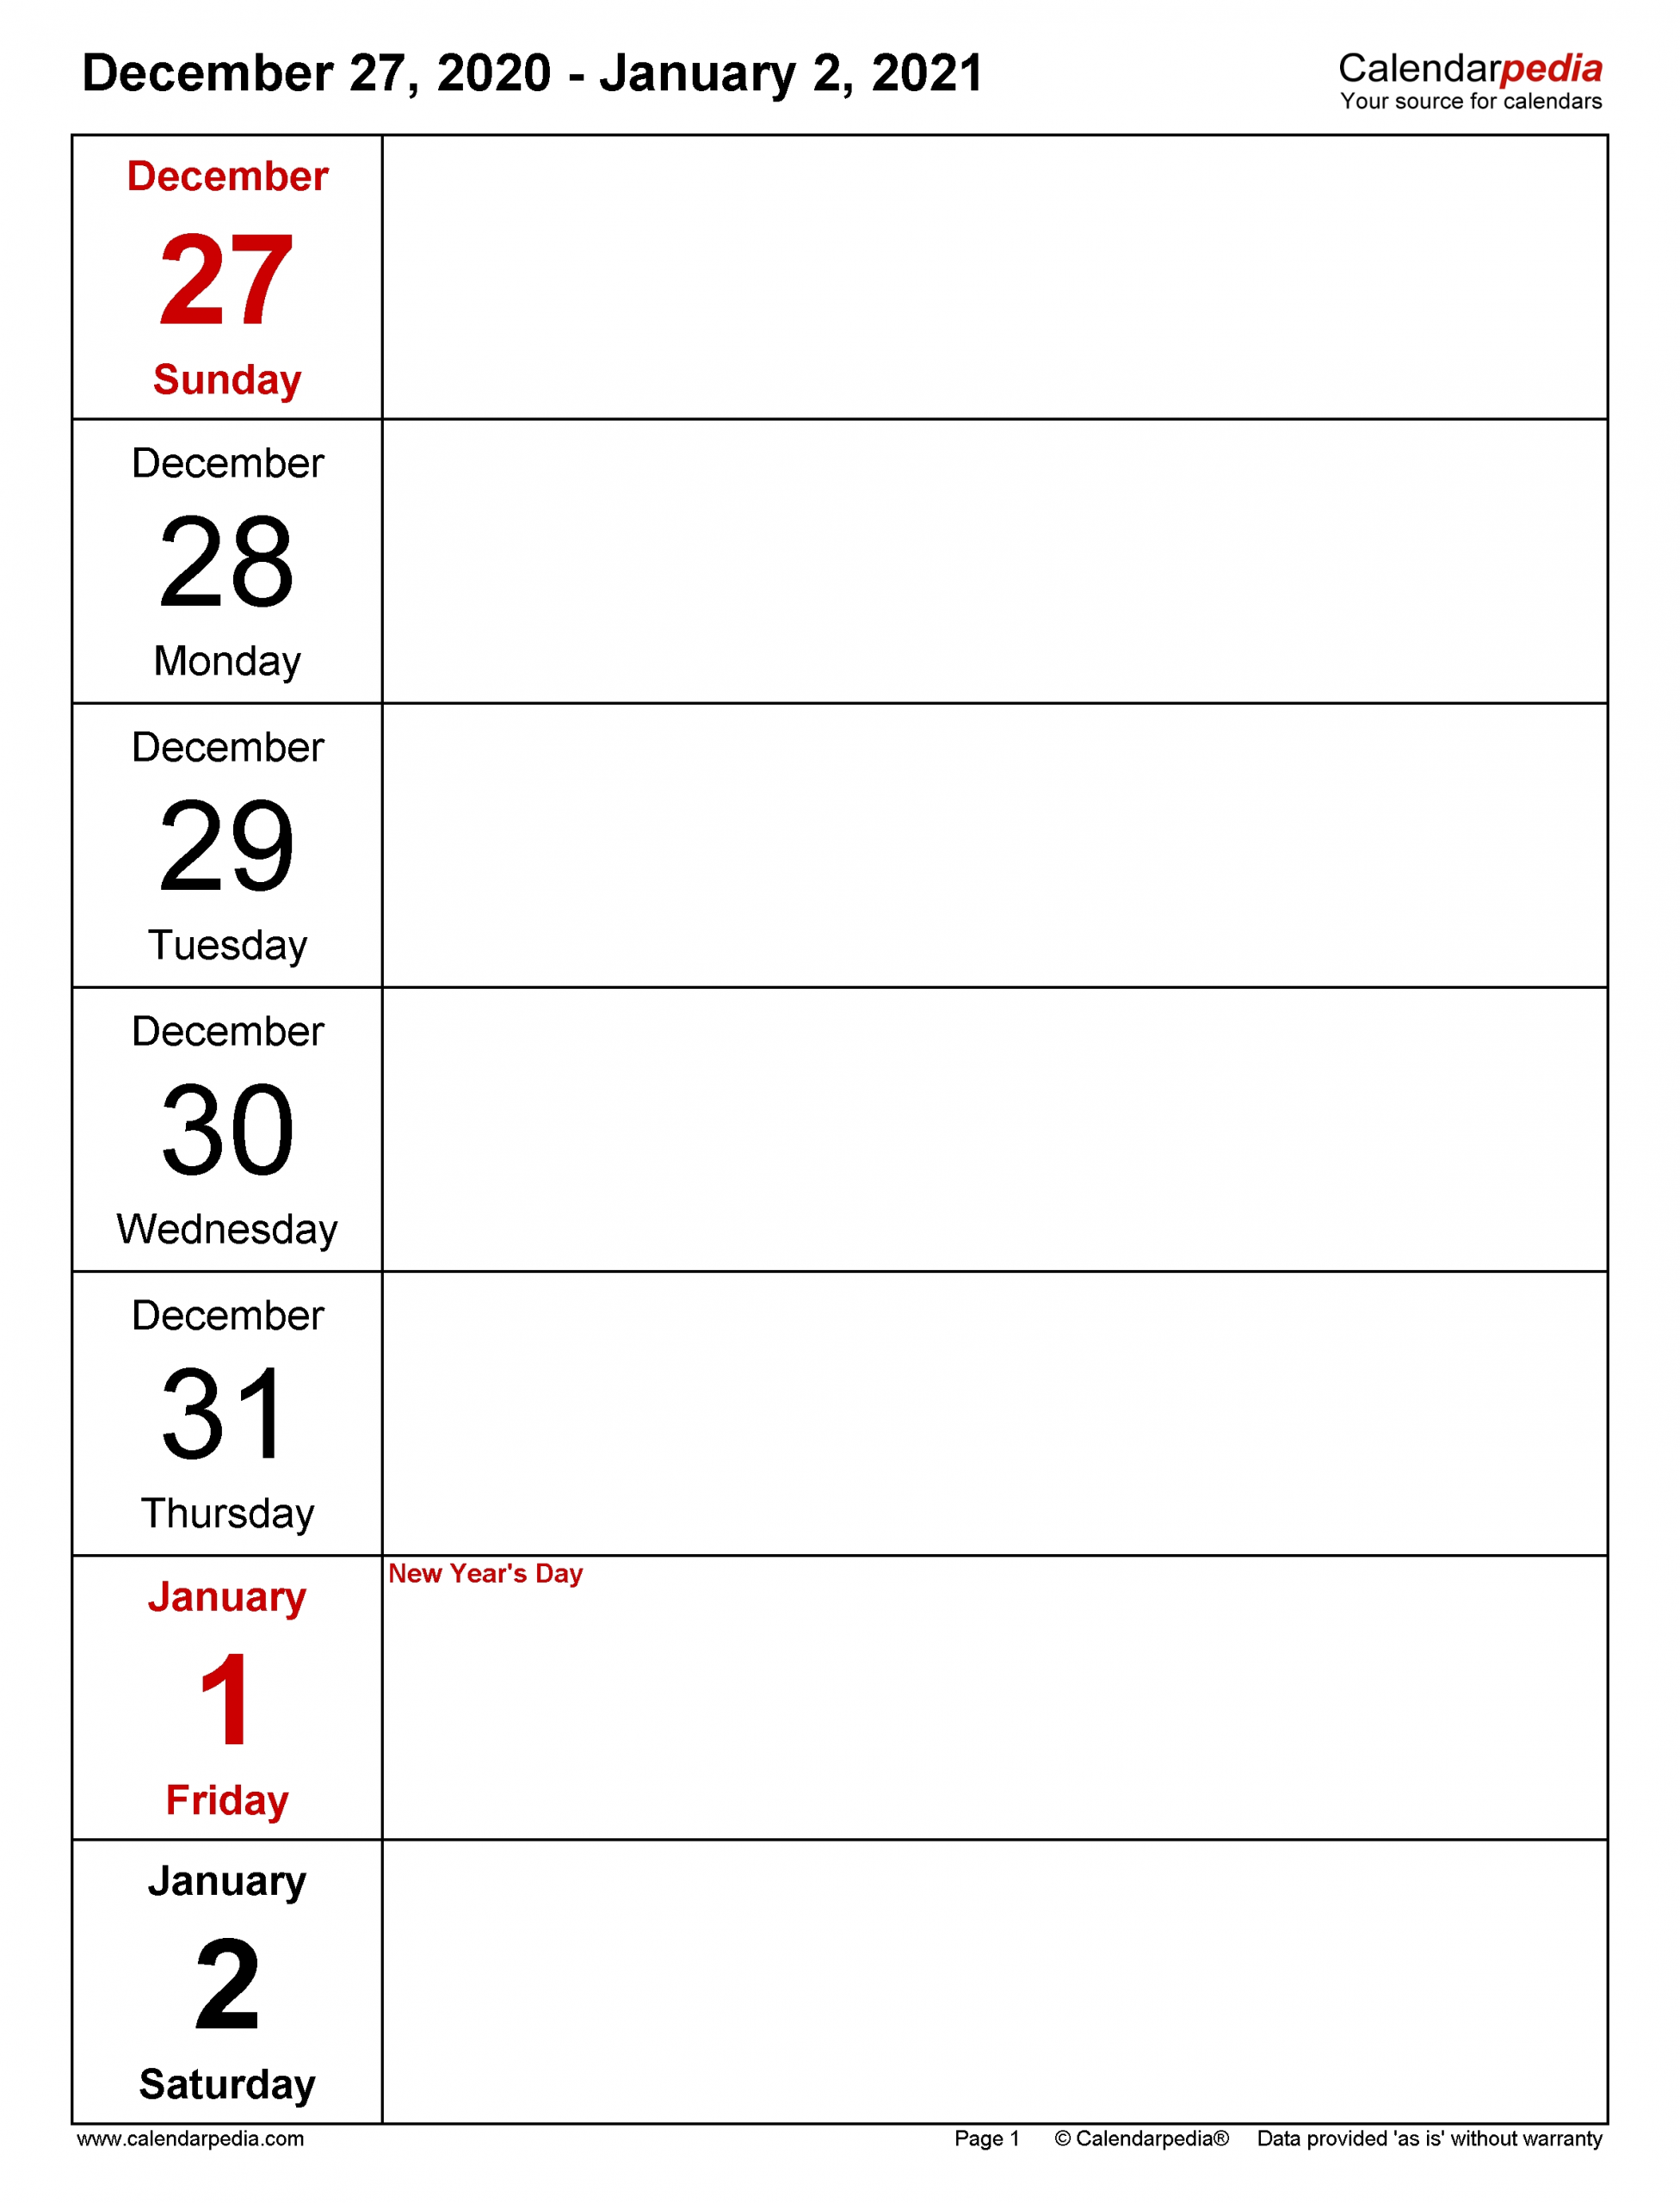 Weekly Calendars 2021 For Pdf - 12 Free Printable Templates  5 Day Week Printable Calendars 2021